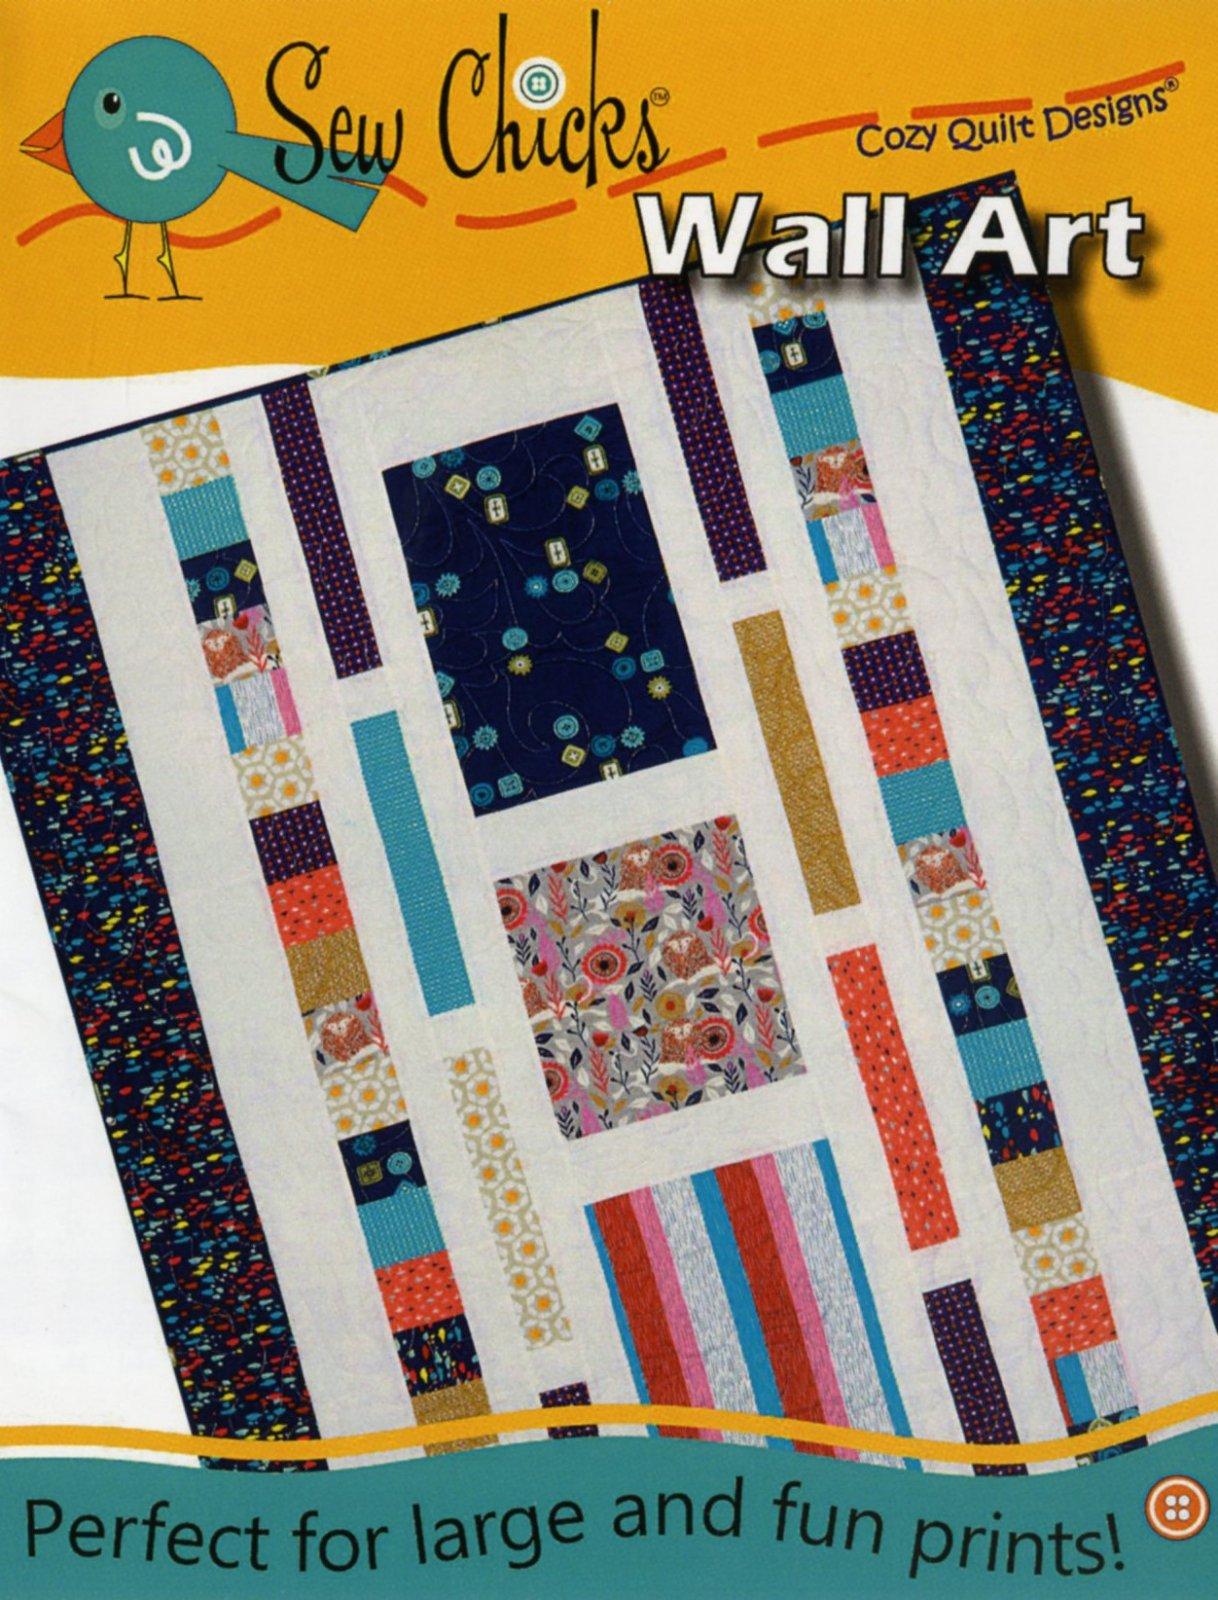 Sew Chicks - Wall Art